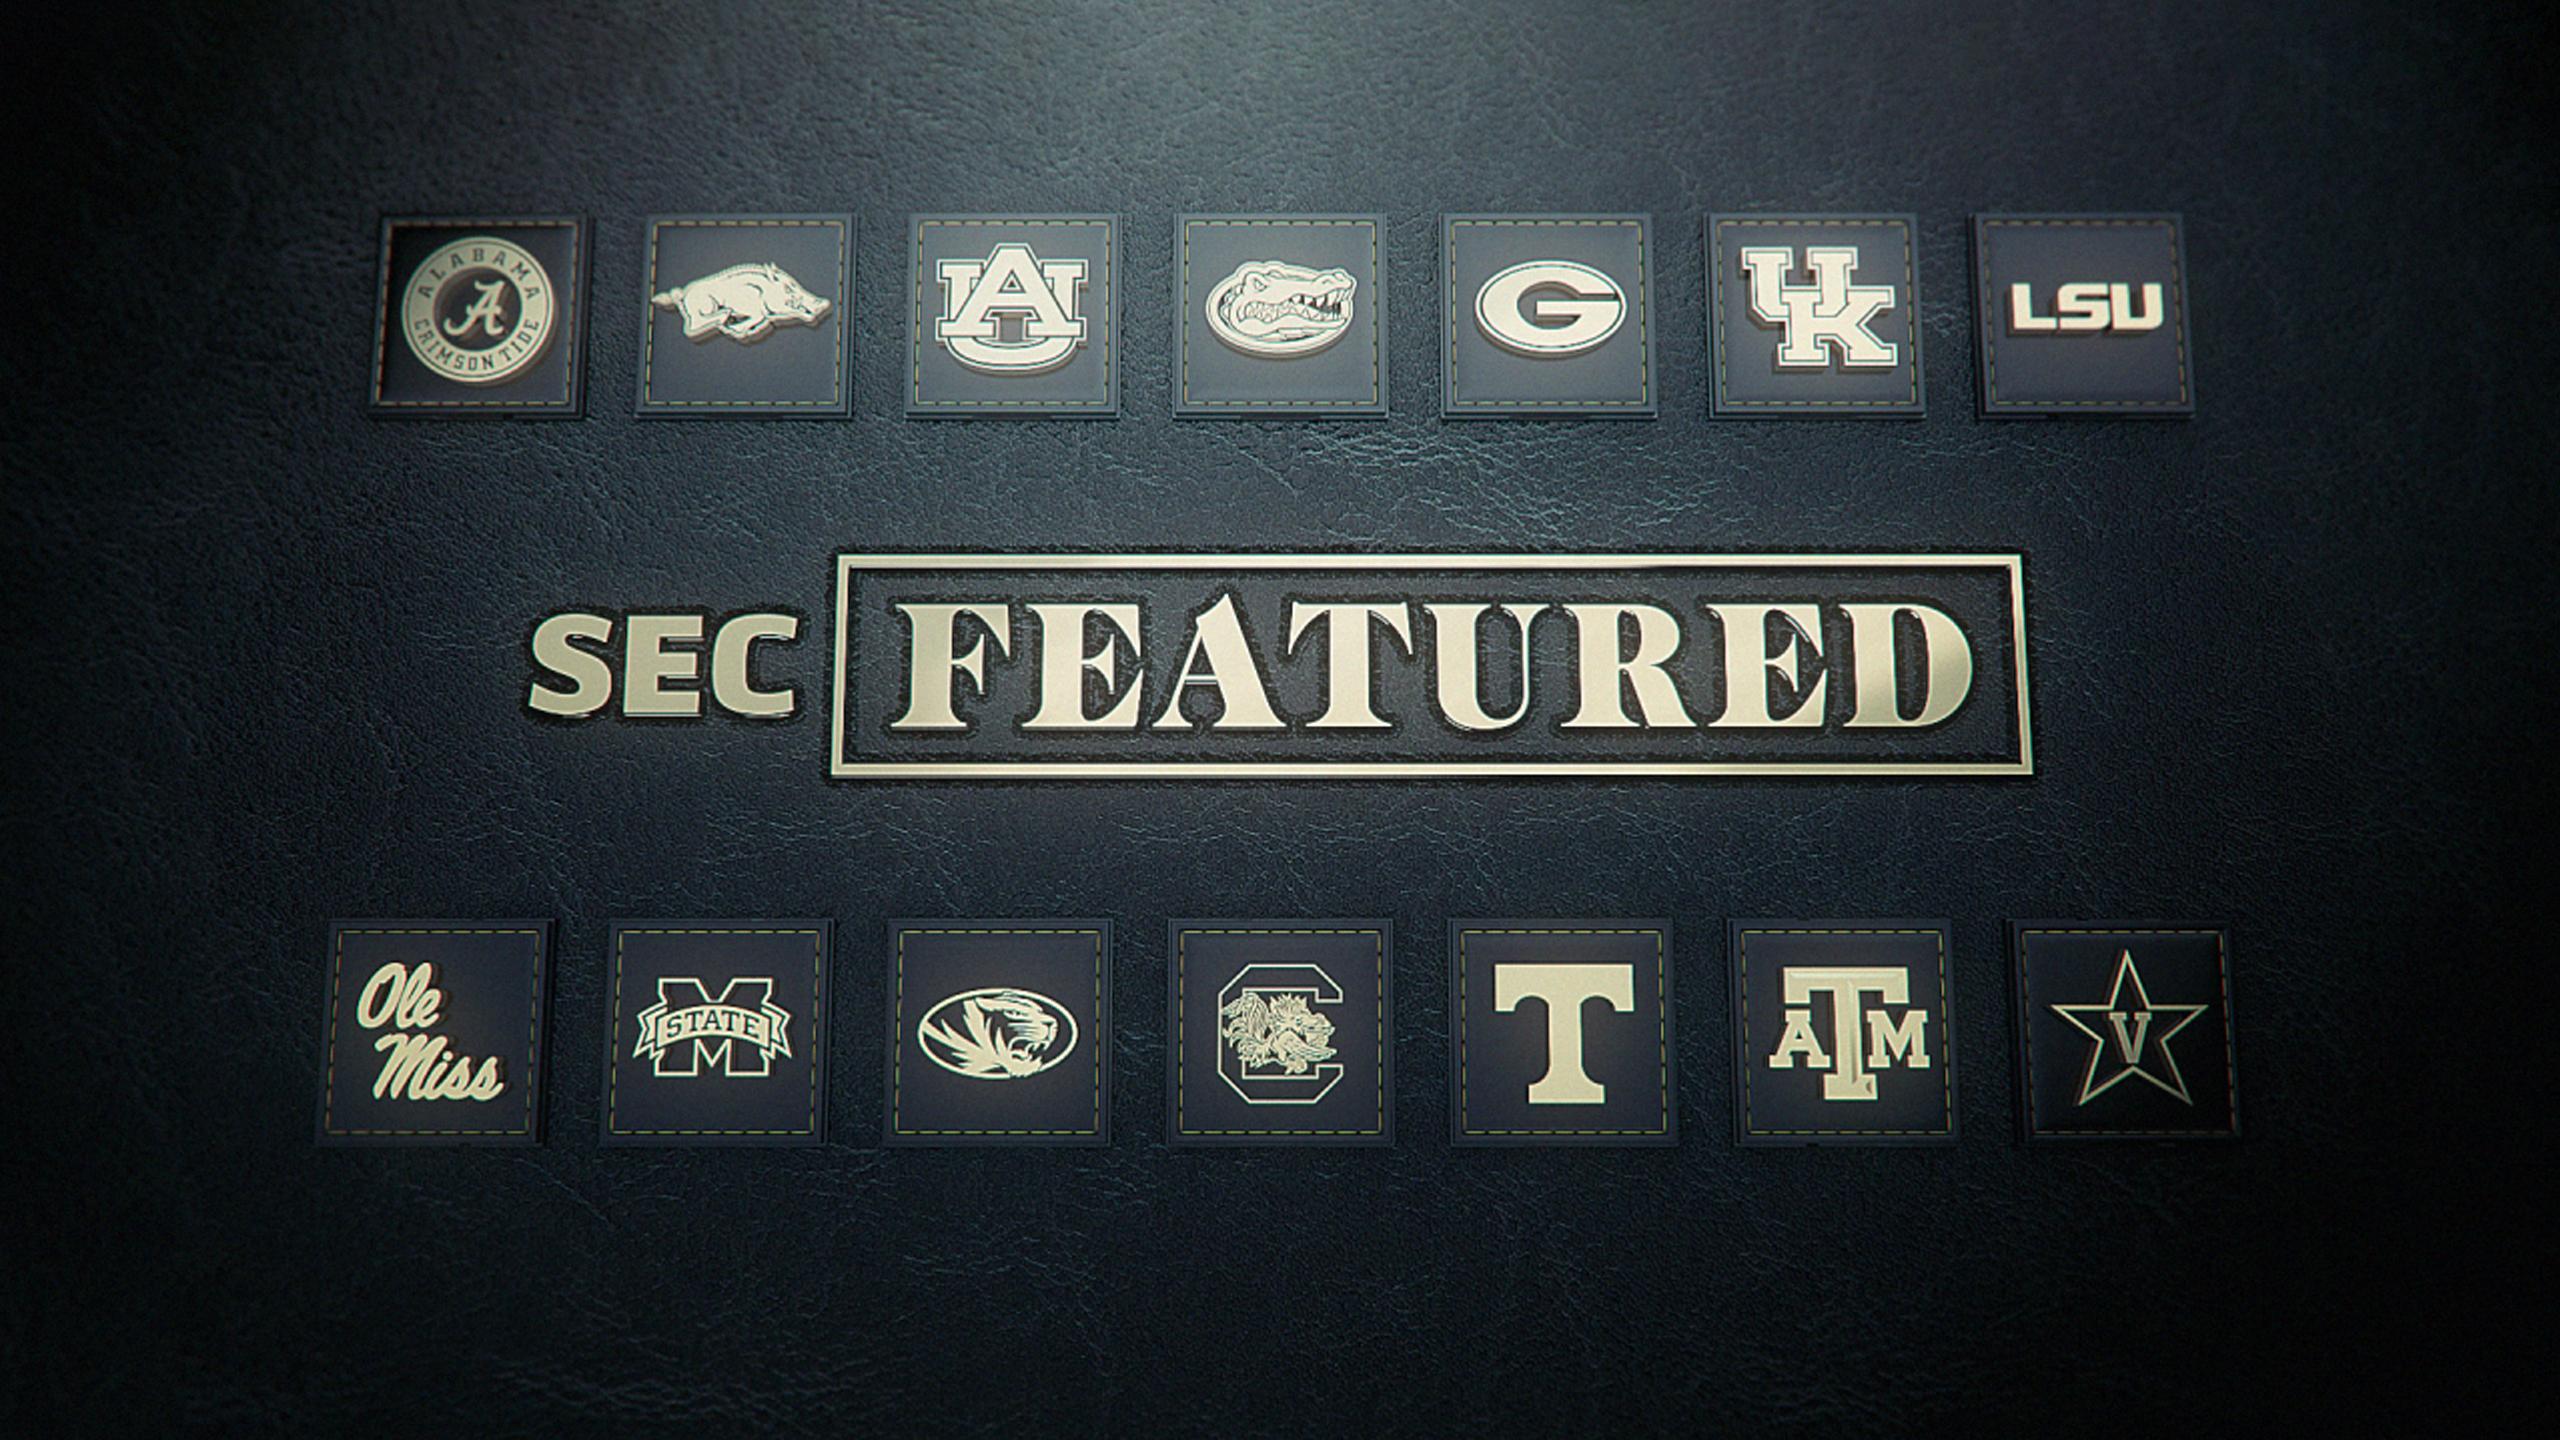 SEC Featured Presented by Belk